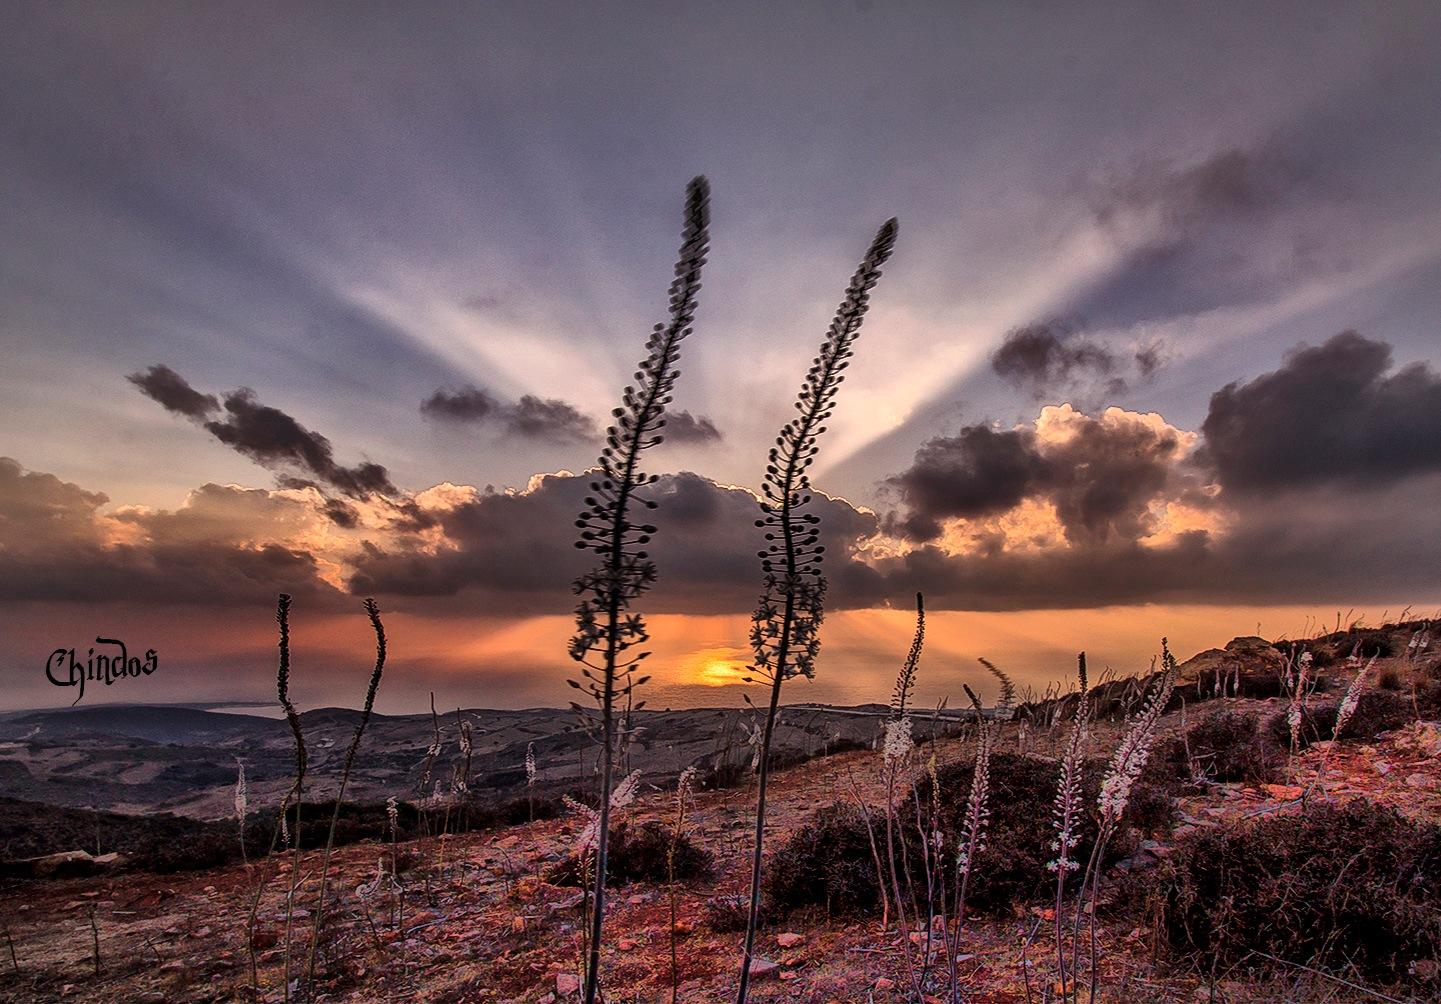 Akamas Cyprus by Chindos